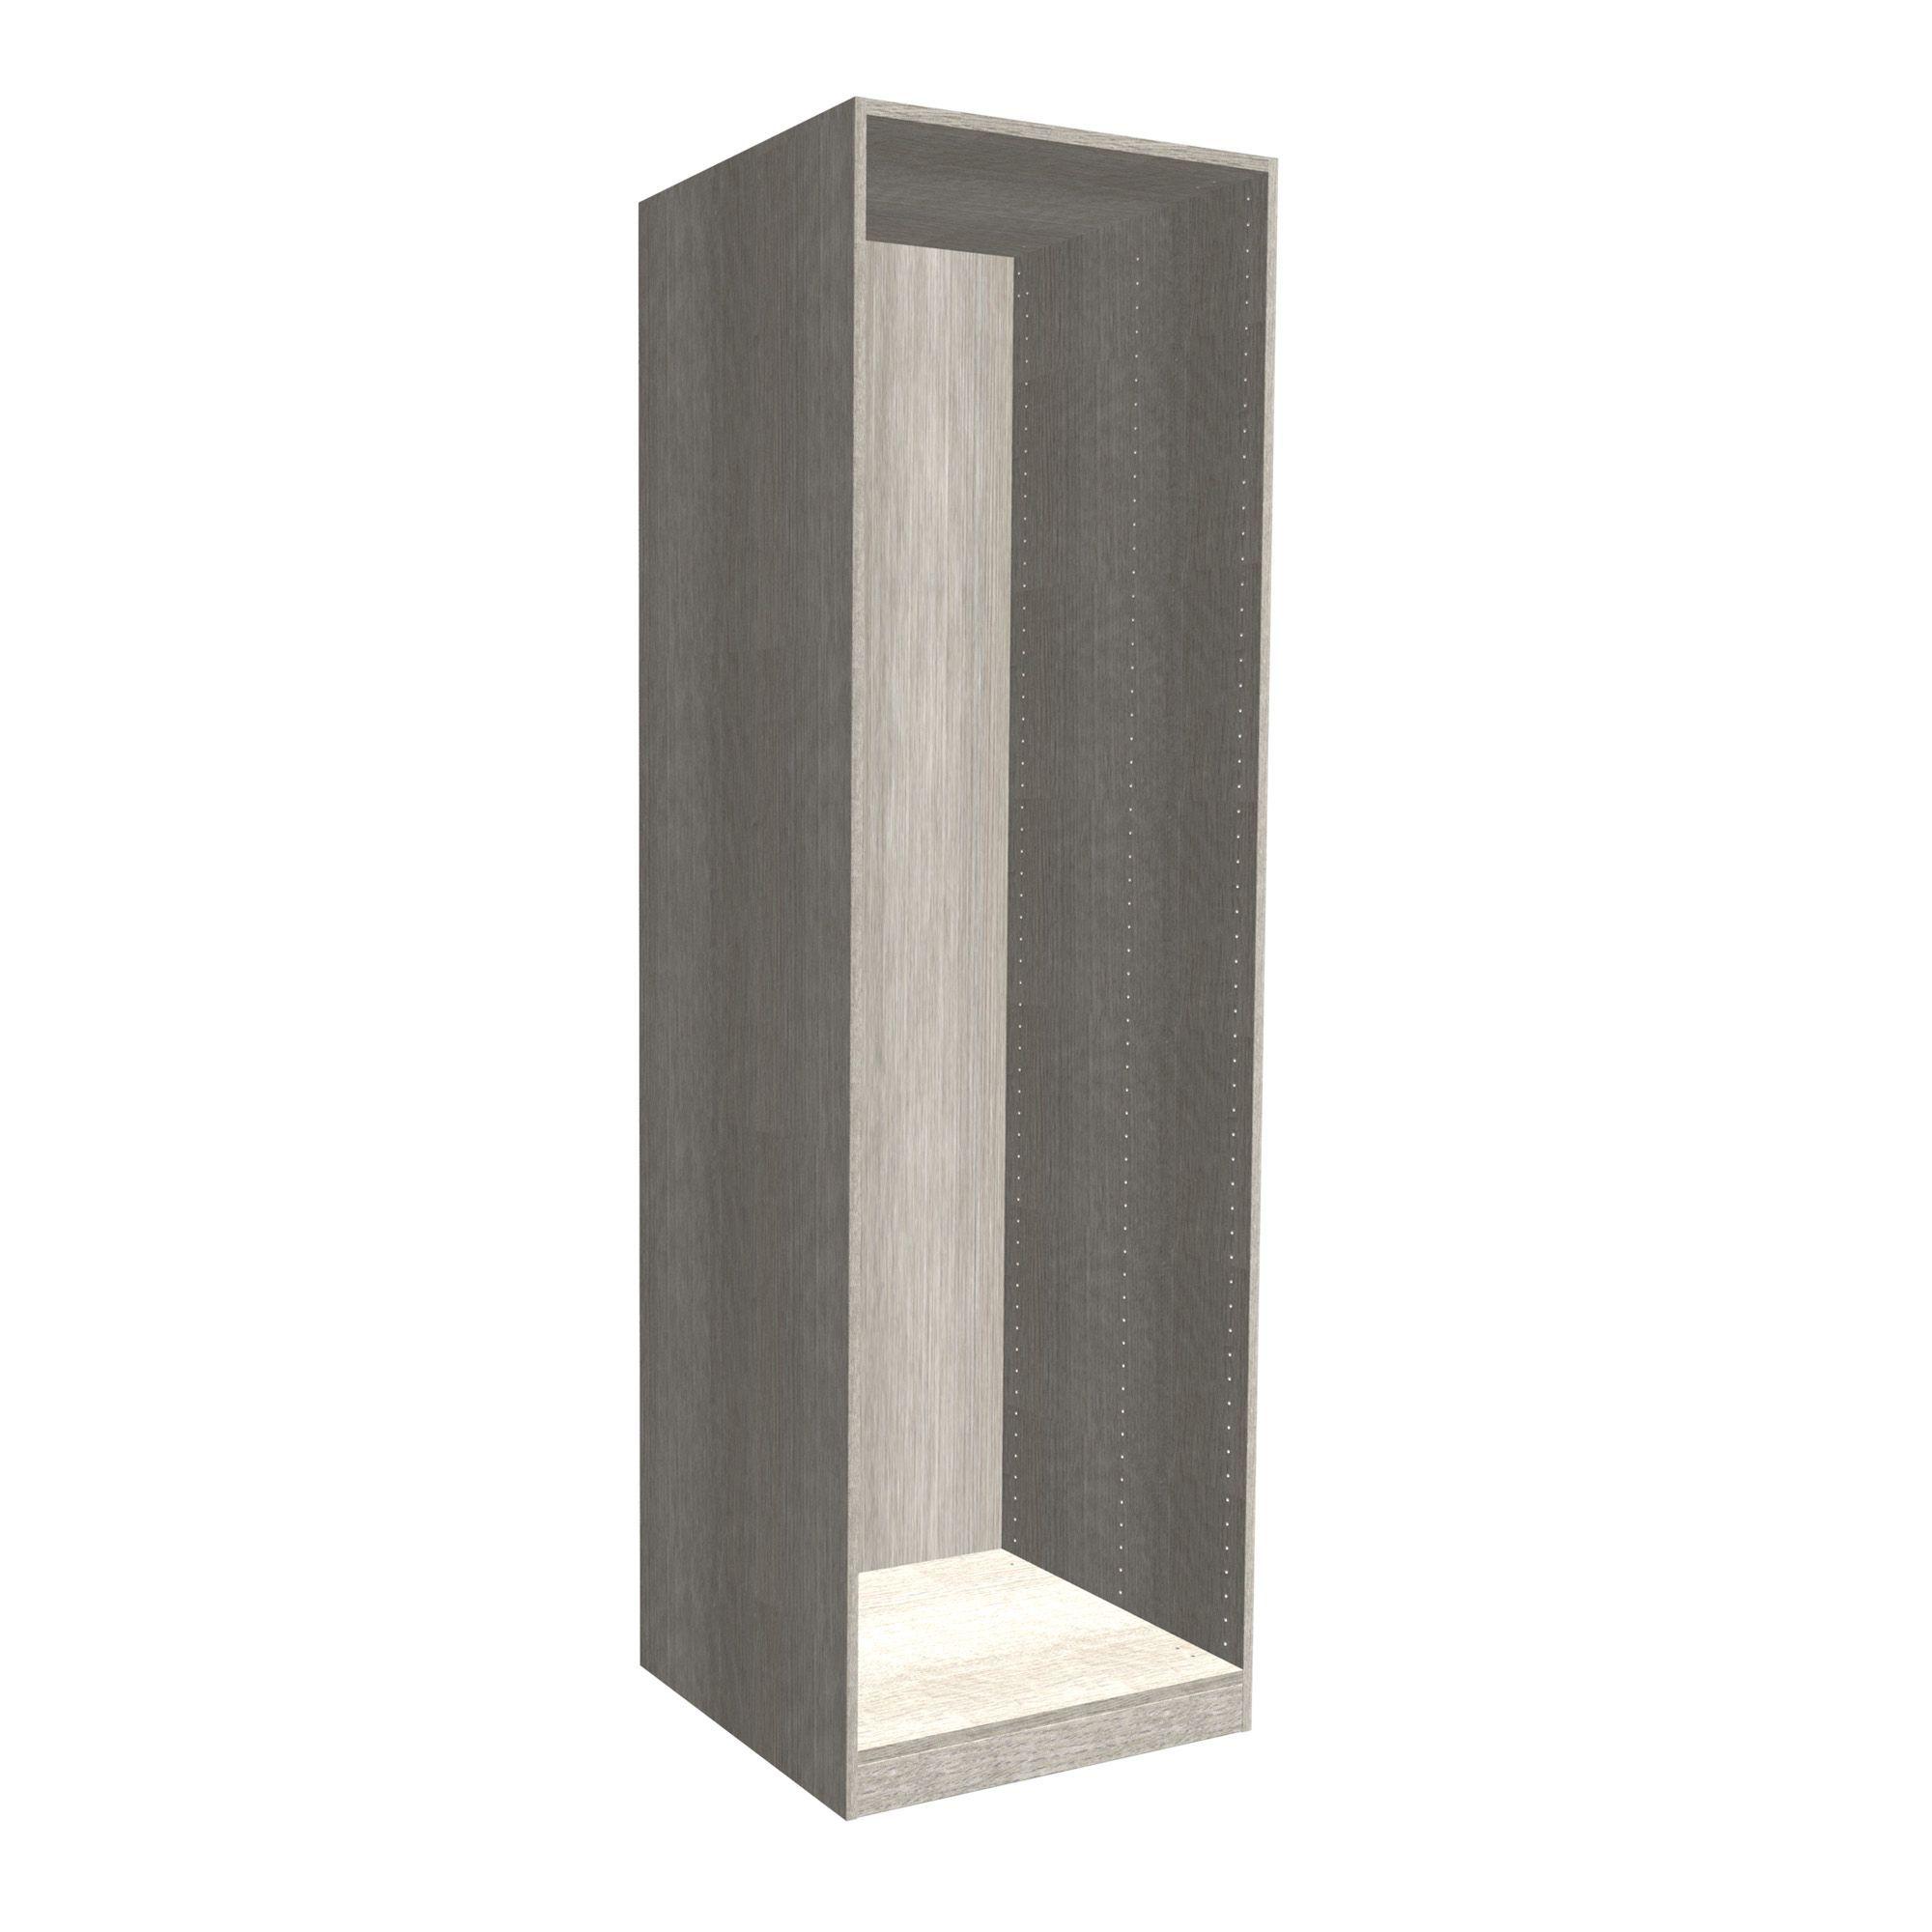 Darwin Modular Matt Grey Oak Effect Wardrobe Cabinet (h)2004mm (w)500mm